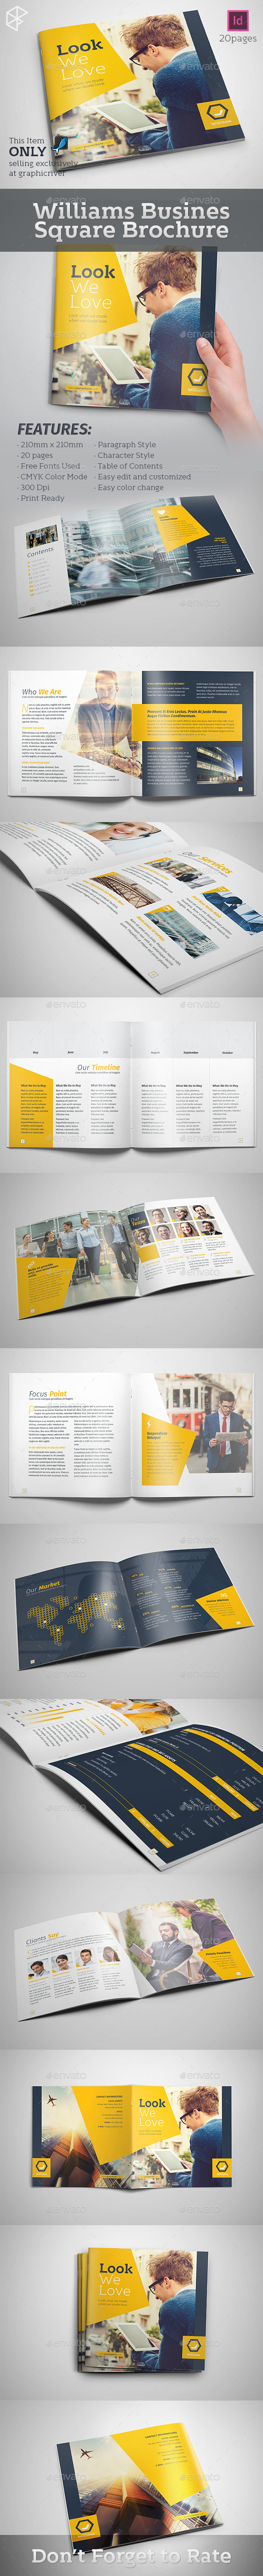 Williams Business Square Brochure - Corporate Brochures